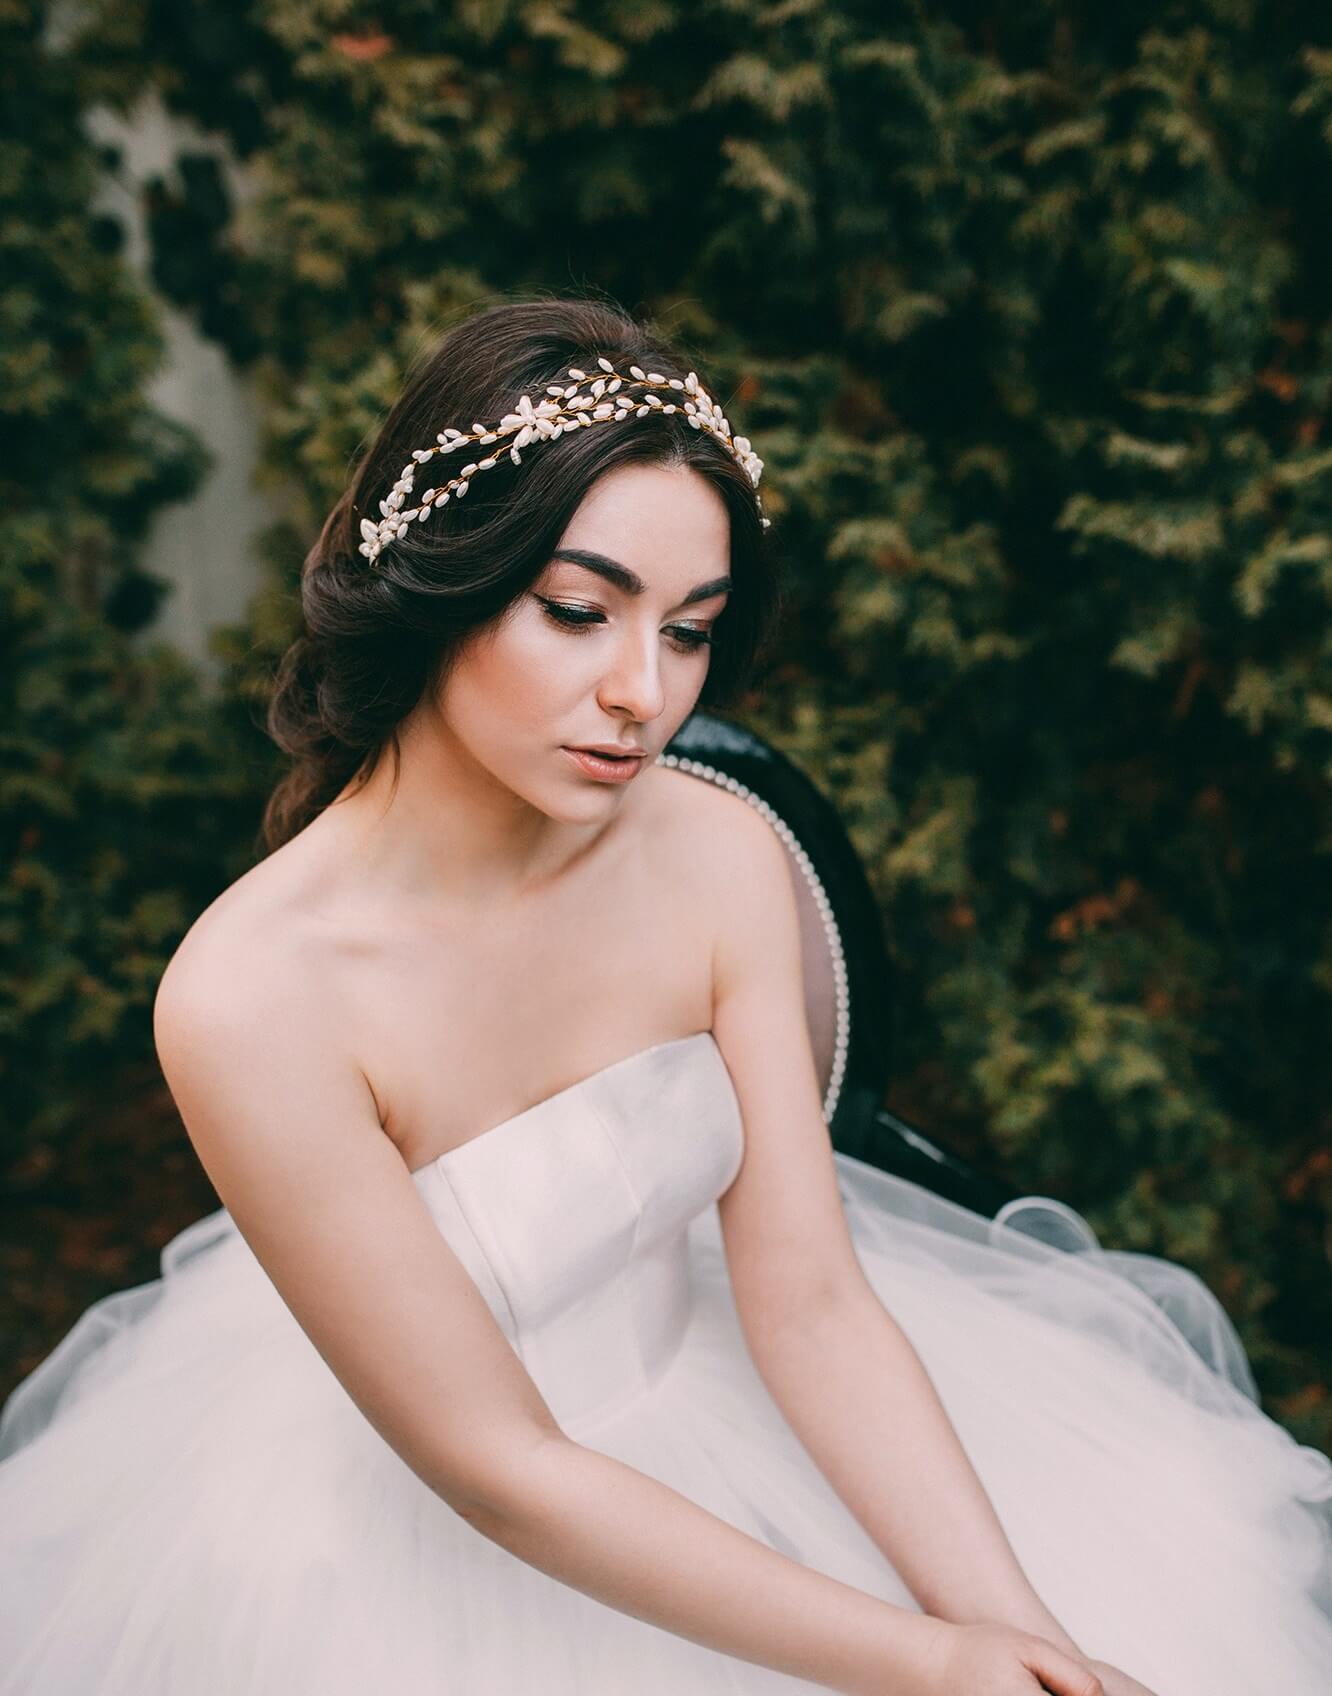 pearls-headband-bridal-crown-wedding-tiara-by-biano-on-dawanda-com